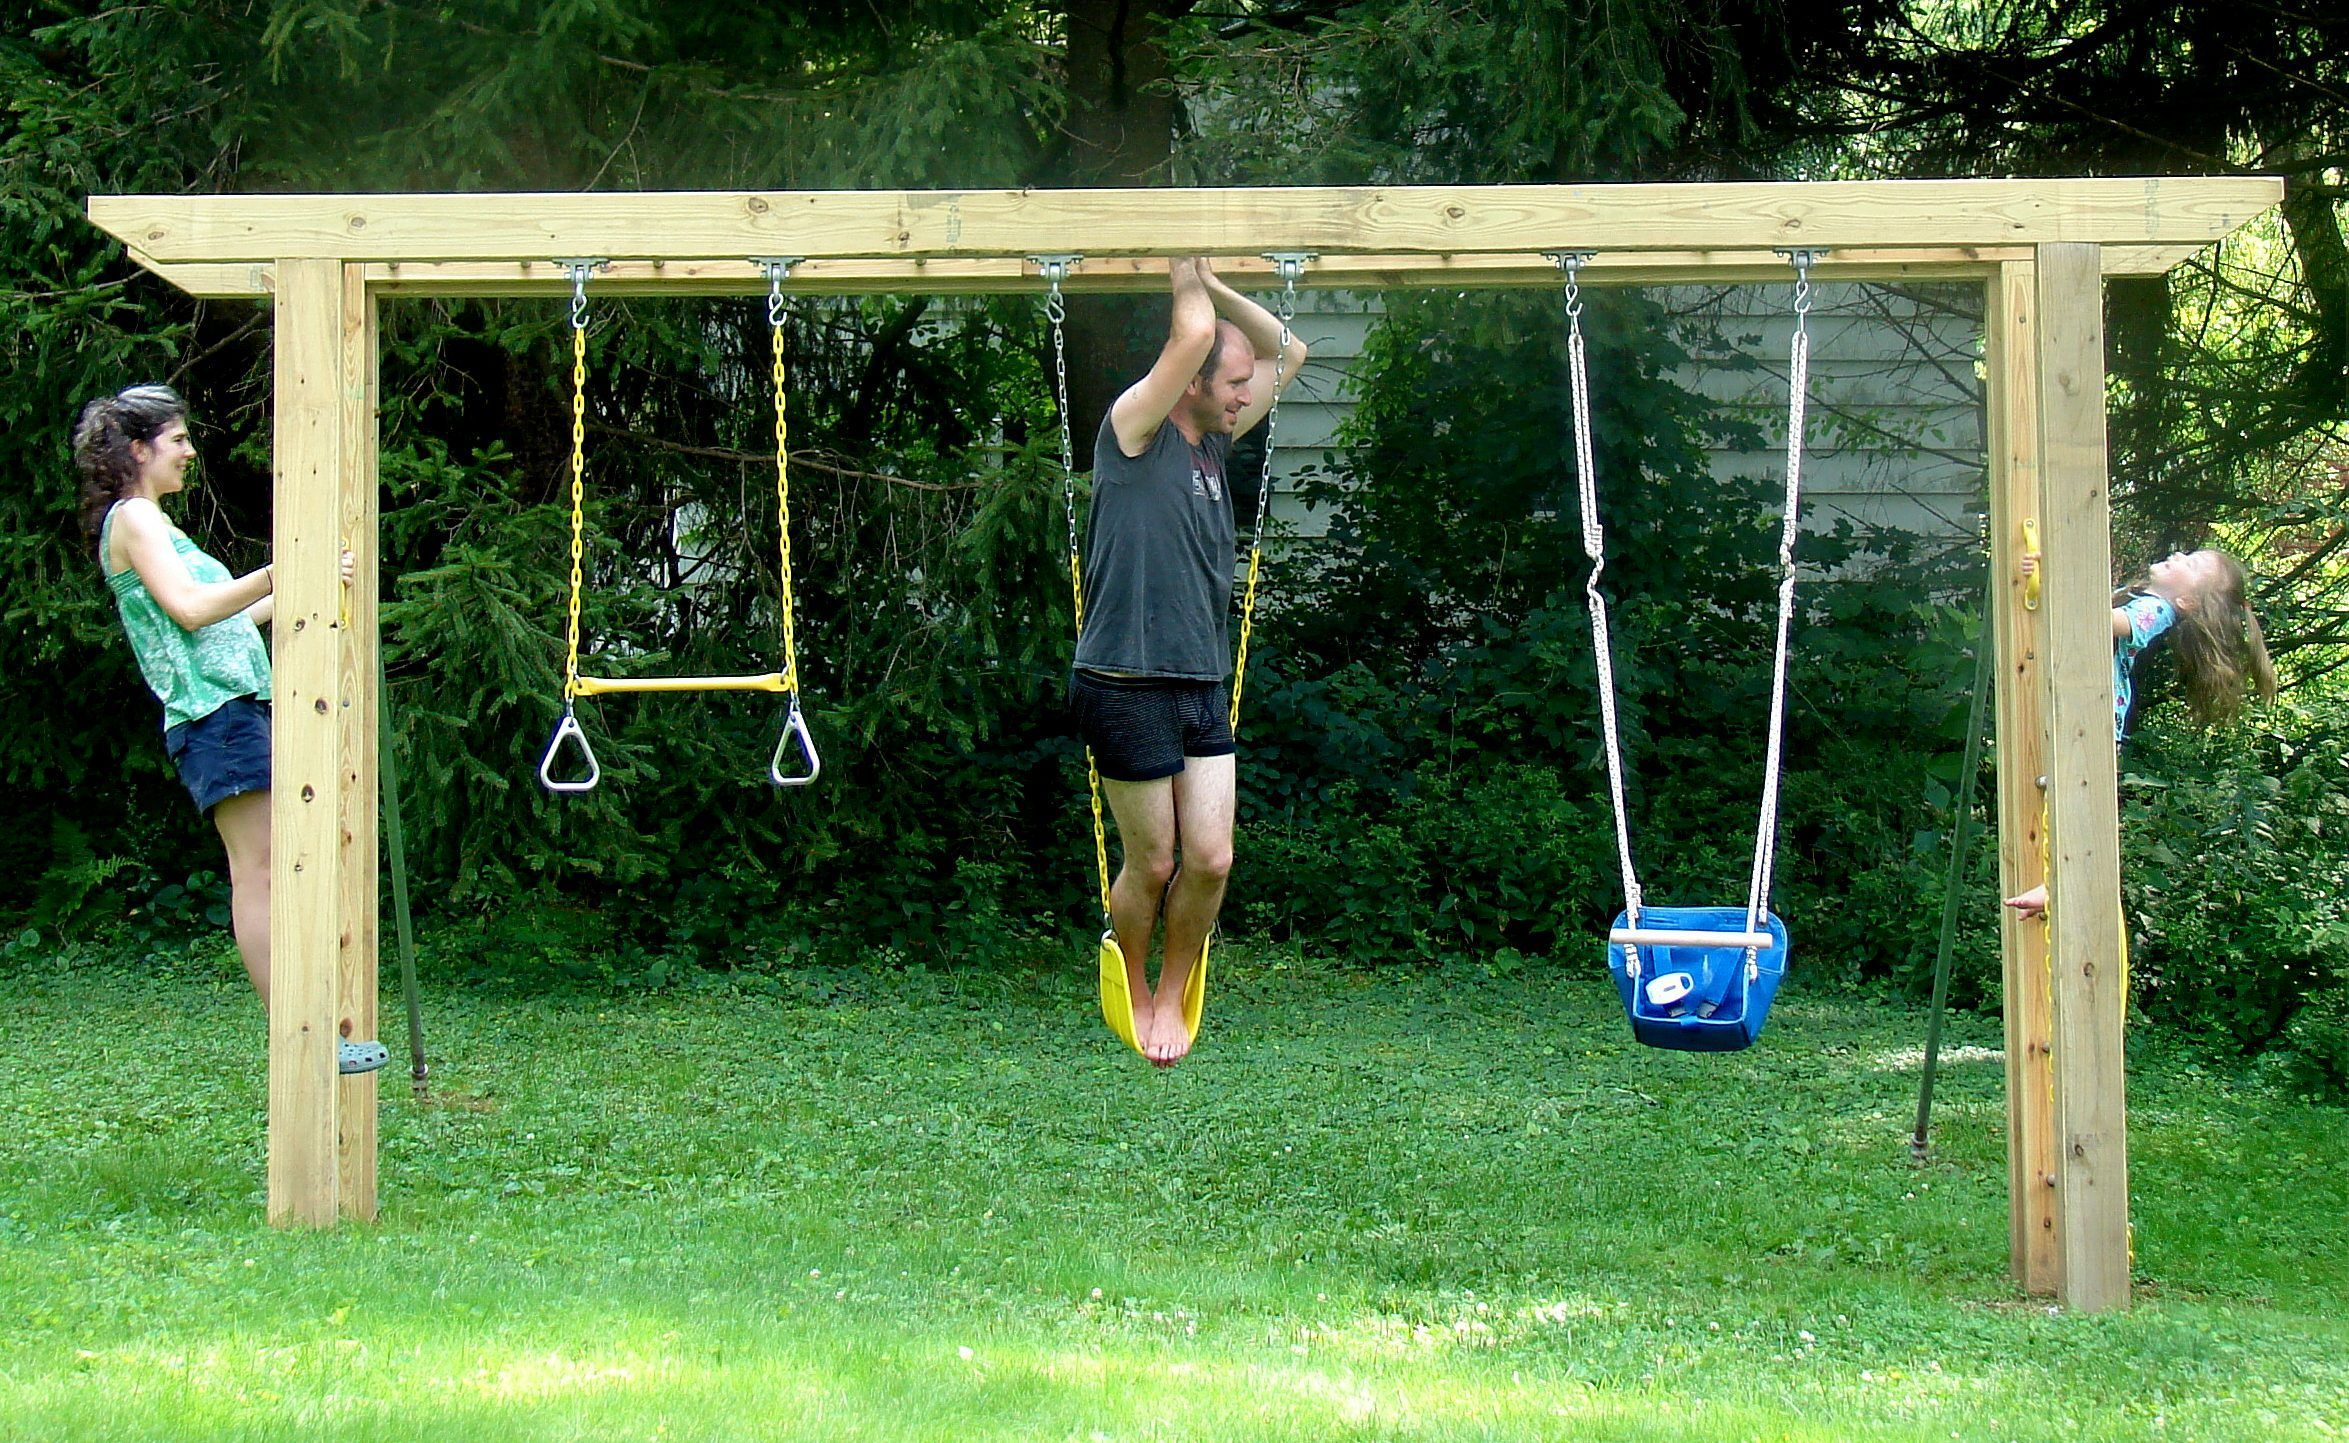 Arbor Swing Set Diy Plans Ideas For Playhouse Simple Kids In Backyard Swingset Swingsetplans